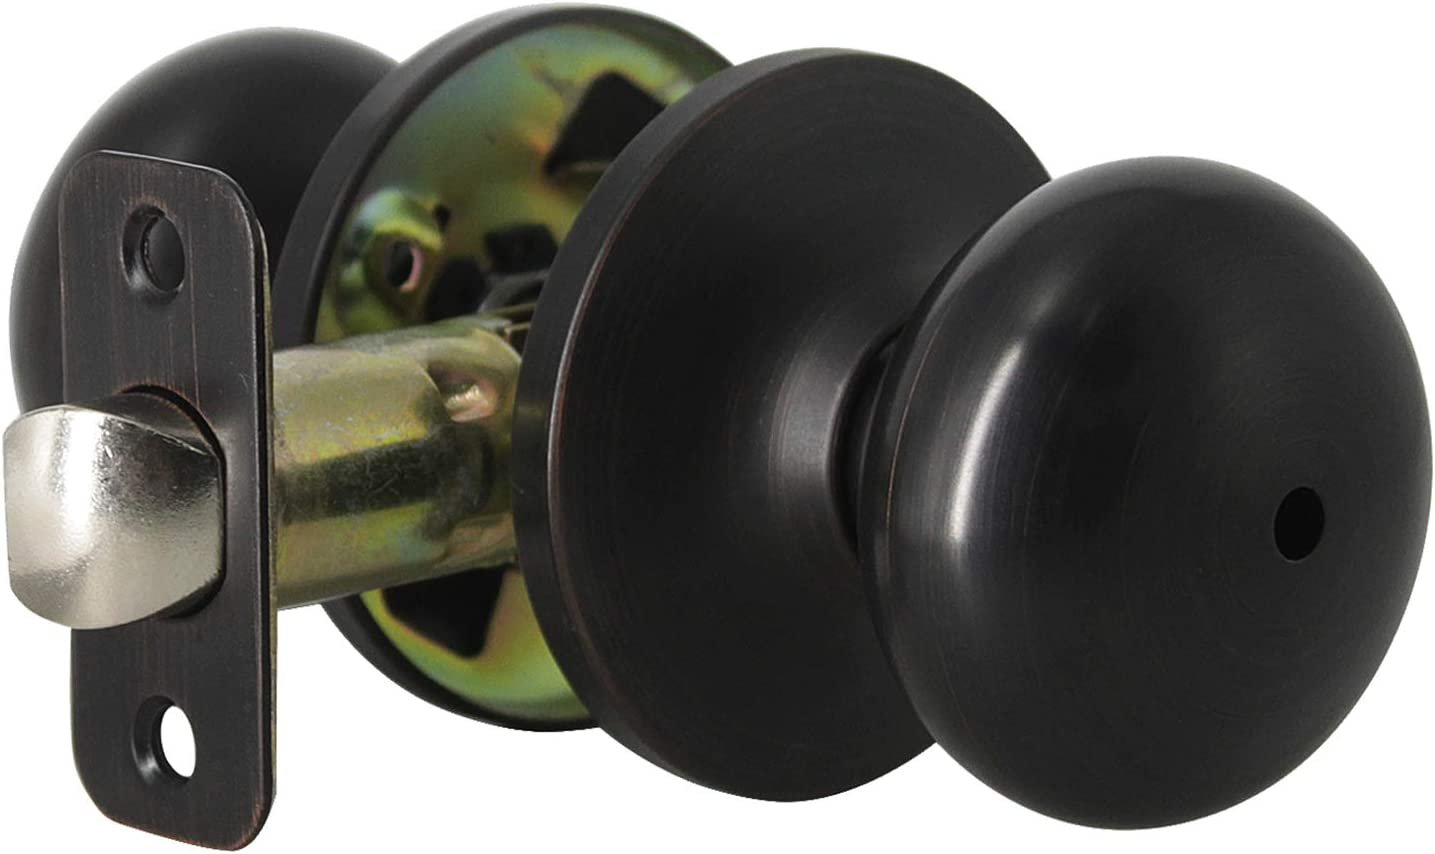 Color : Silver Size S Easy Installation 3-Color Door Lock Cylinder Head Cover for Locking Wooden Door Hardware in Bedroom Bathroom Stainless Steel